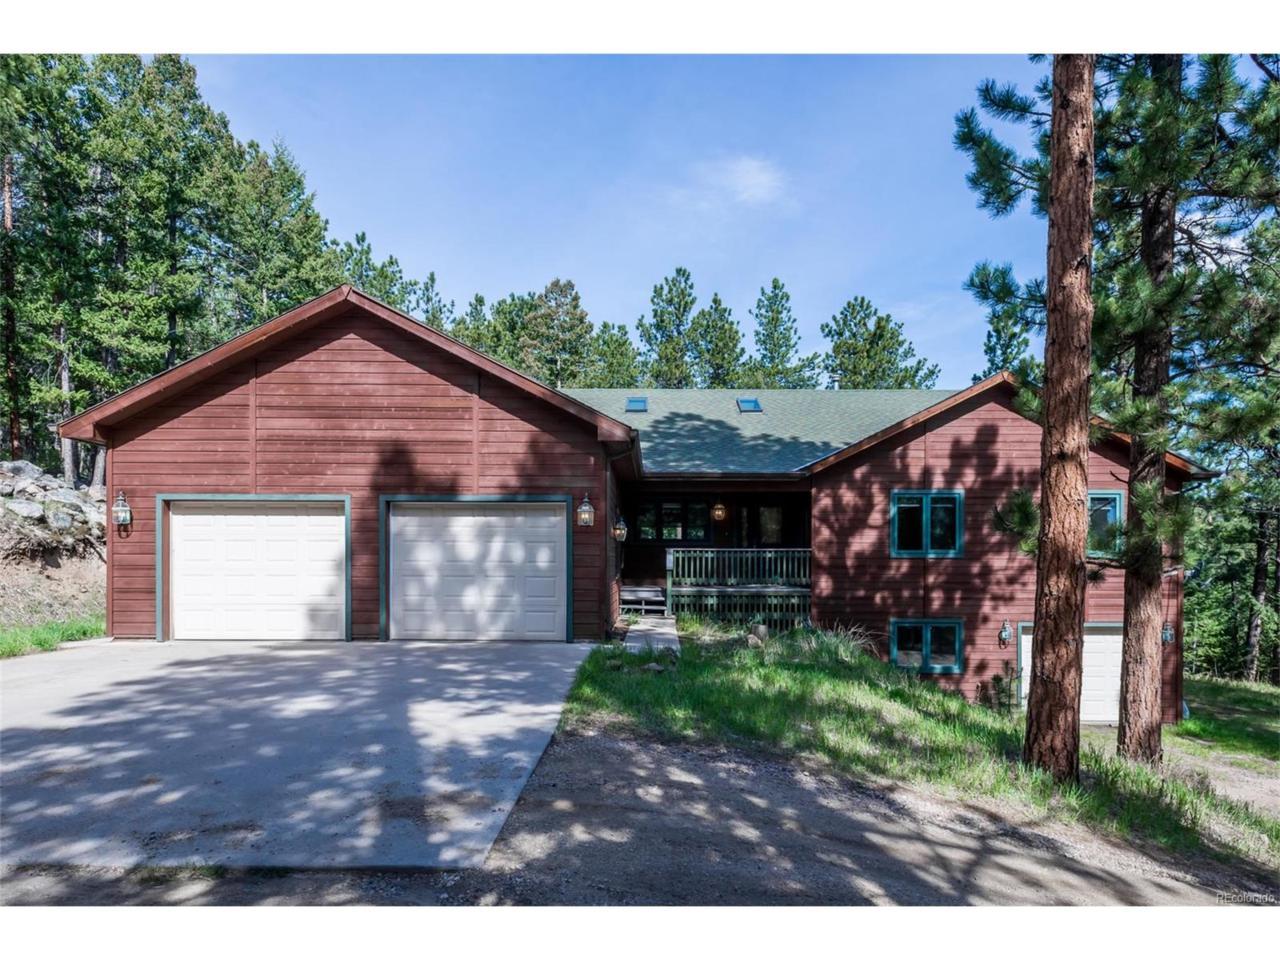 1546 Bluebird Drive, Bailey, CO 80421 (MLS #6798684) :: 8z Real Estate